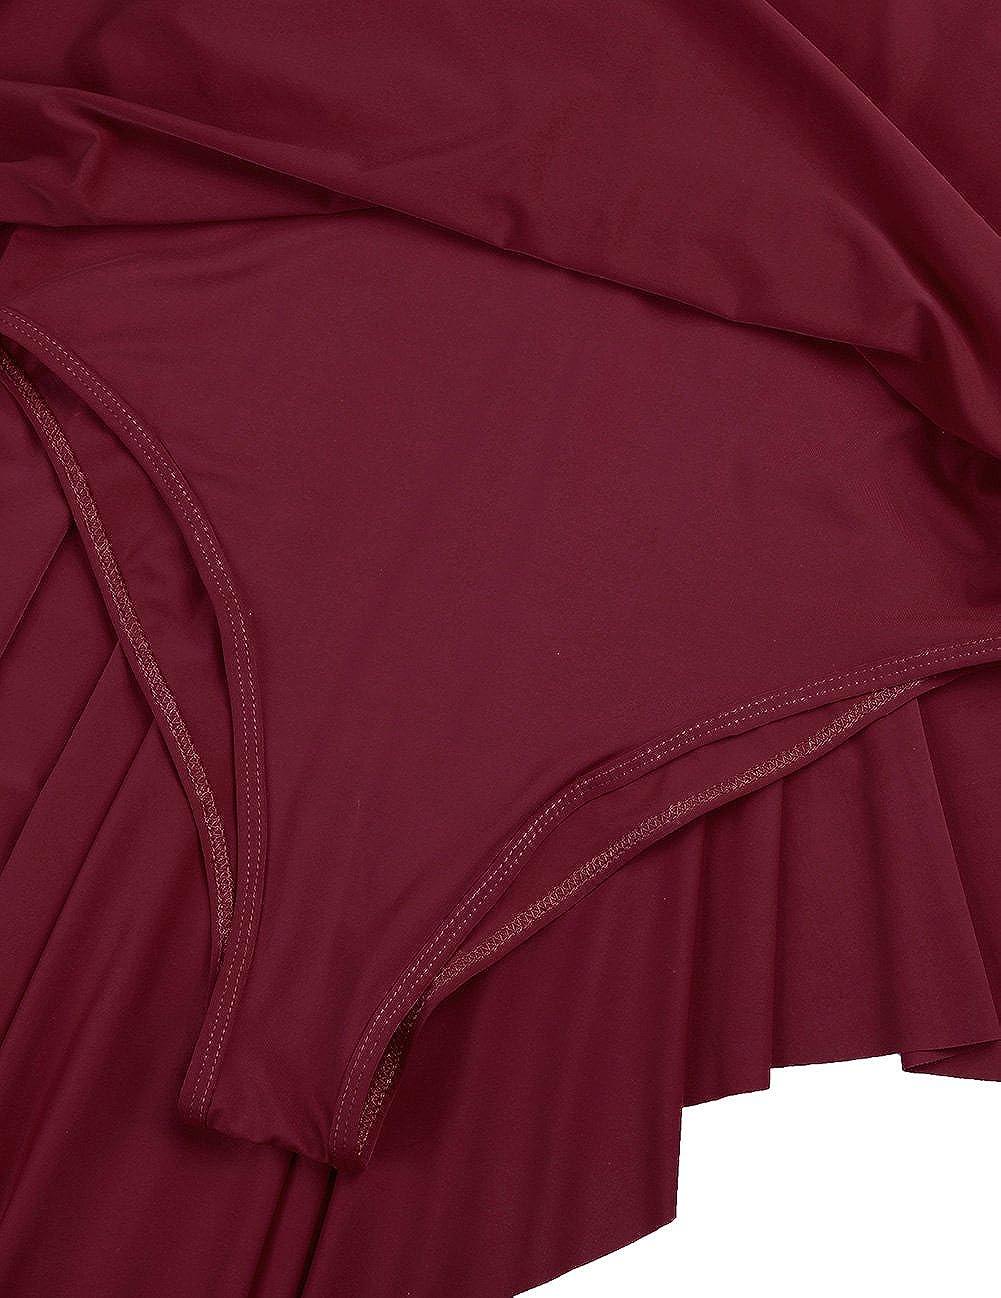 iixpin Women Sleeveless Lyrical Dance Costume Dress Illusion Sweetheart Trianglar Cut Skirt Leotard Ballet Bodysuit